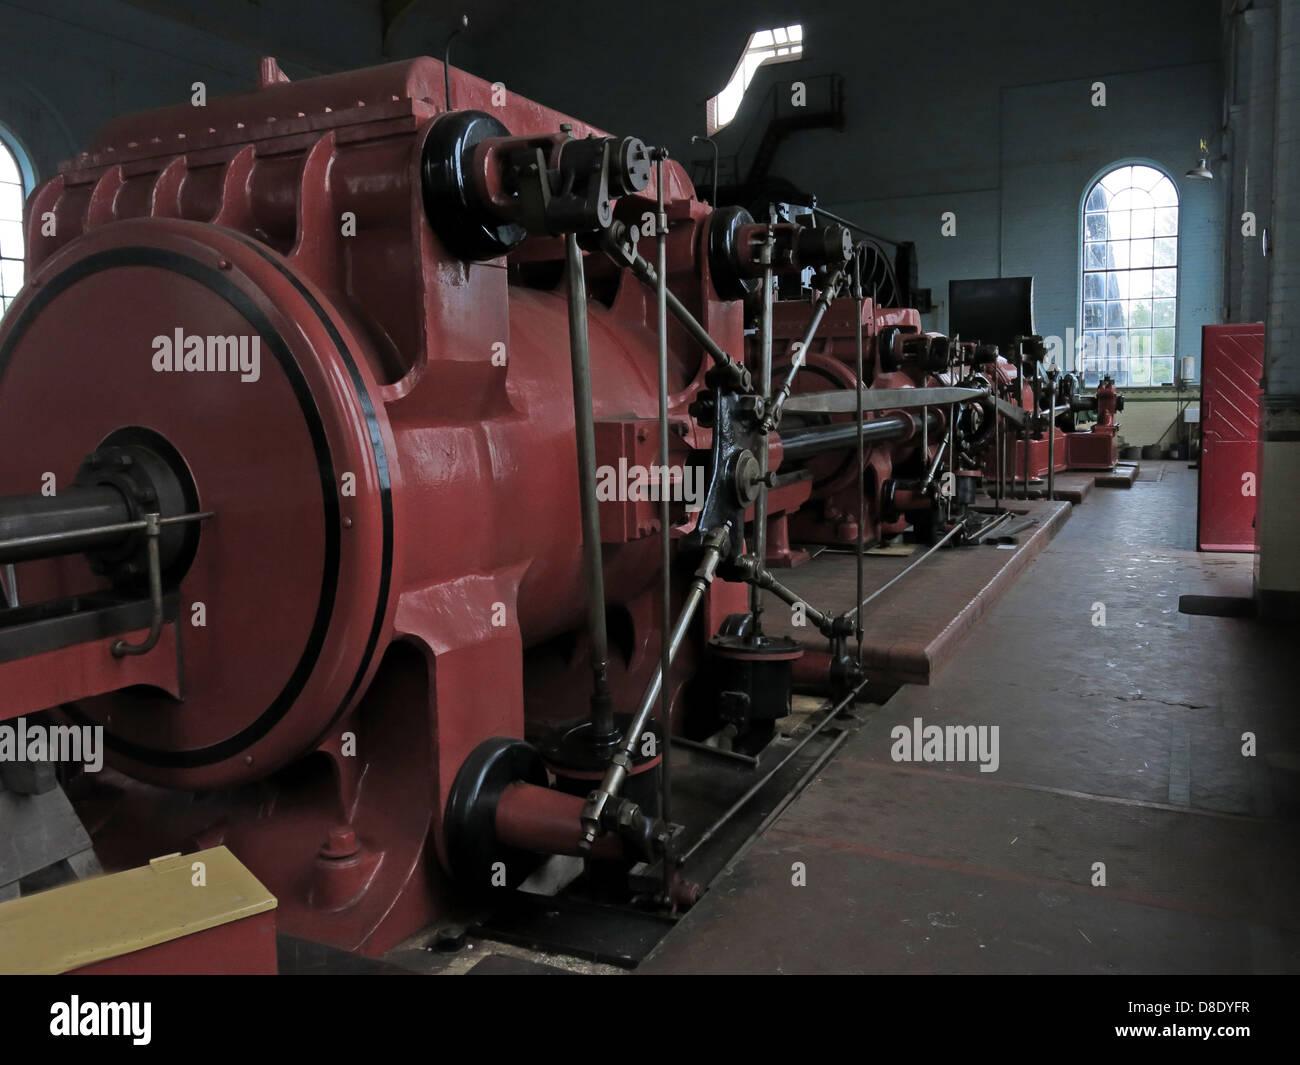 Laden Sie dieses Alamy Stockfoto Rot gewundenen Gang Motor bei Astley Grube, Astley Green, Tyldesley, Manchester, Lancashire, UK M29 7JB - D8DYFR